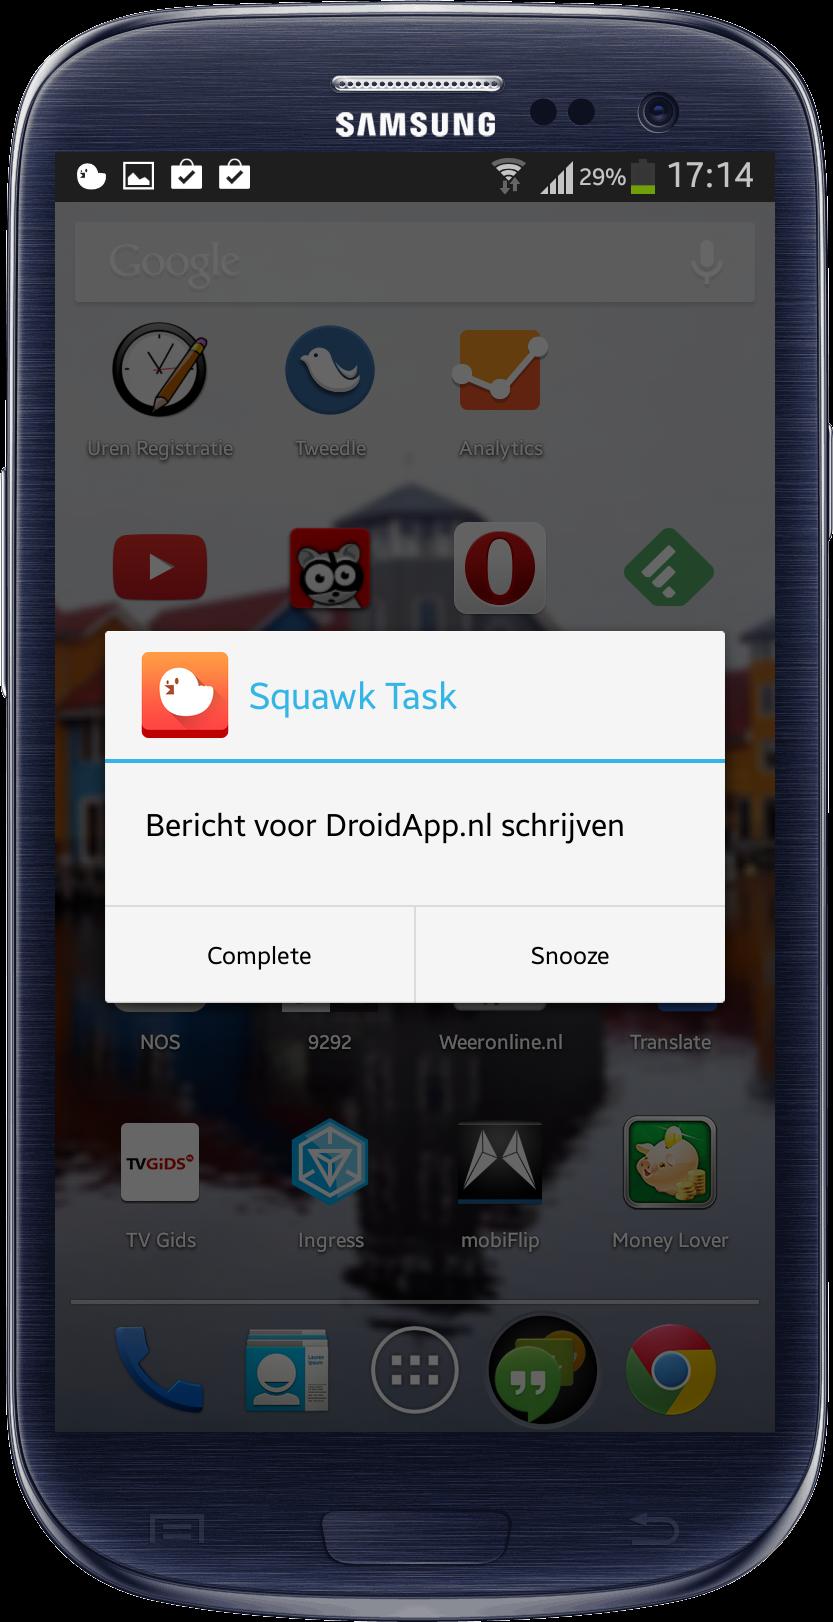 Squawk 2